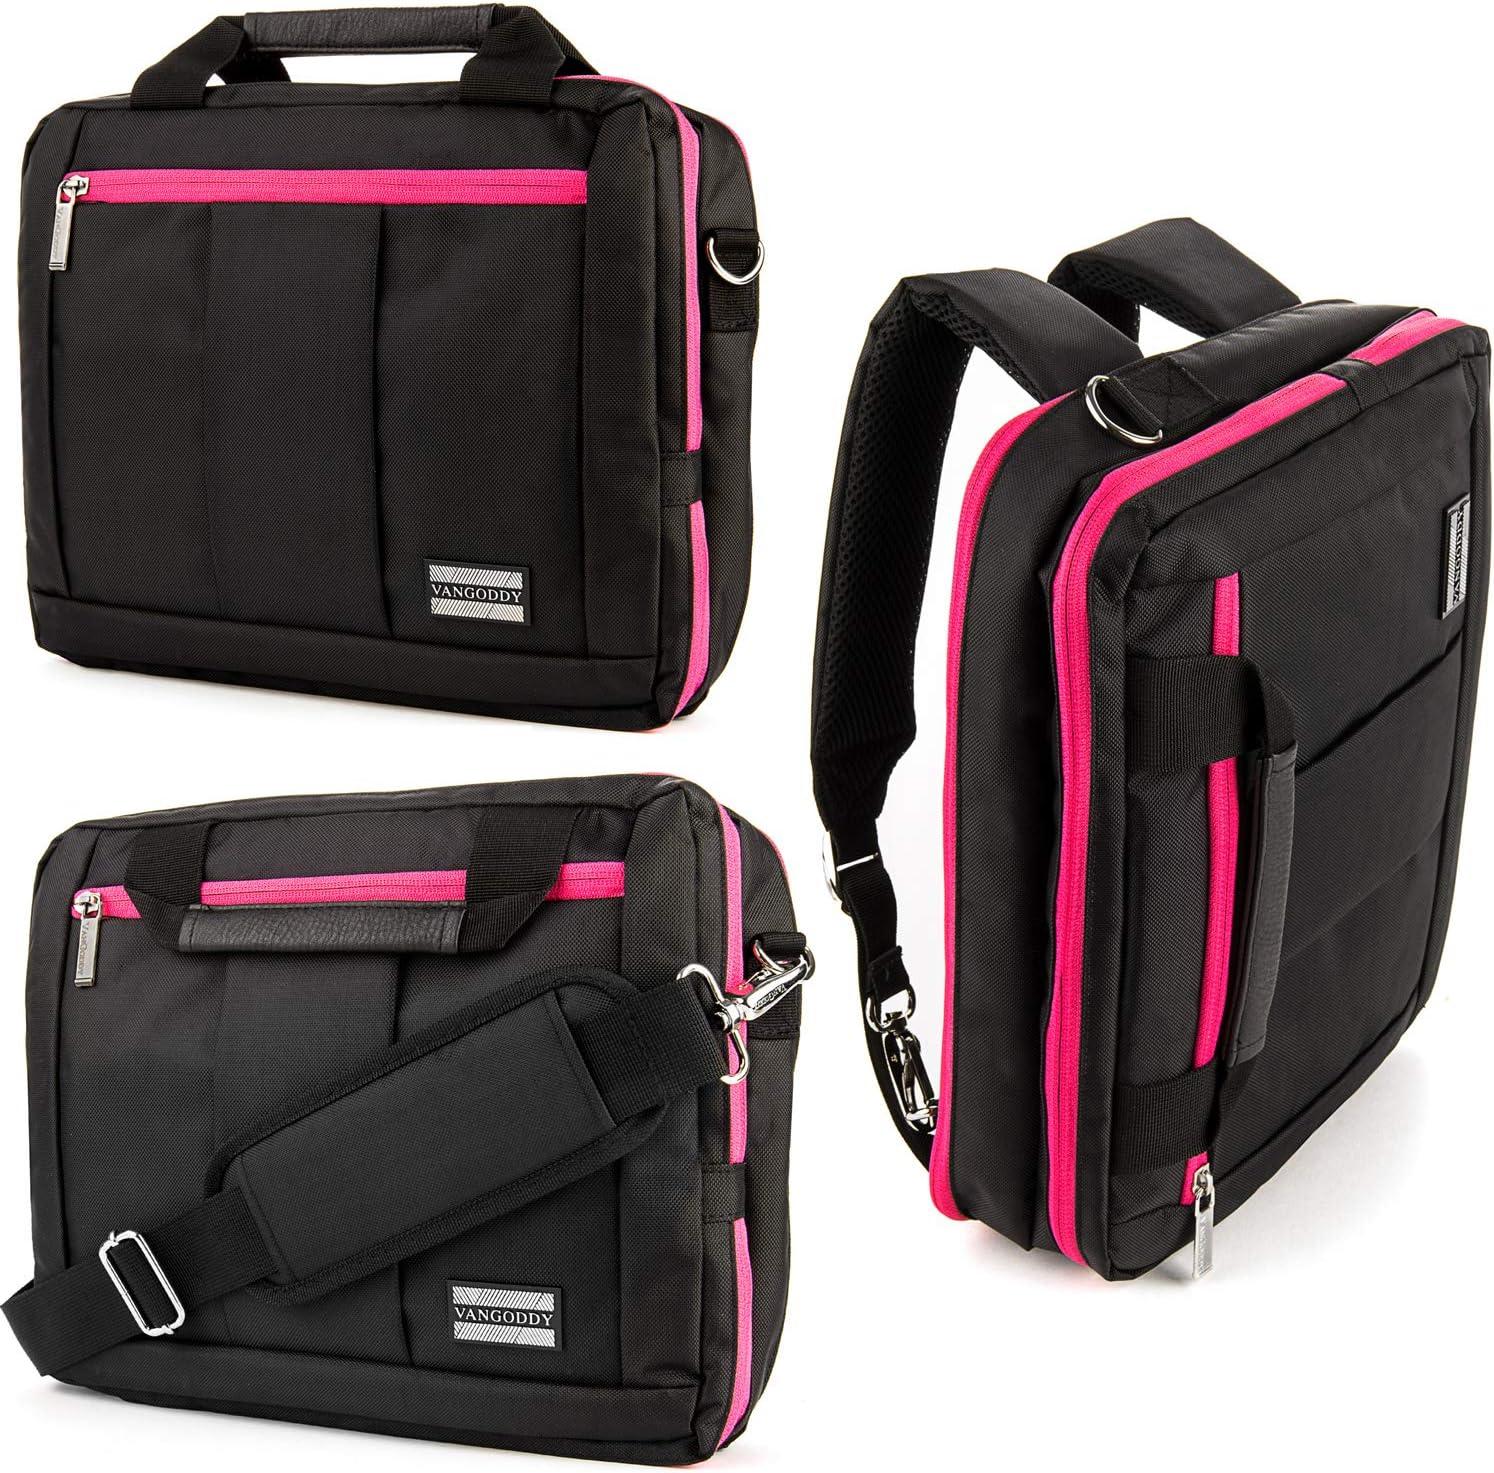 13.3 14 in Laptop Shoulder Bag for Dell Inspiron 5391 7390 5400 5481 5491 5493 7490, Latitude 3310 3410 5300 5310 5400 5410 5411 7310 7400 7410 9410, Vostro 5391 3490 5401 5490, XPS 13 7390 9300